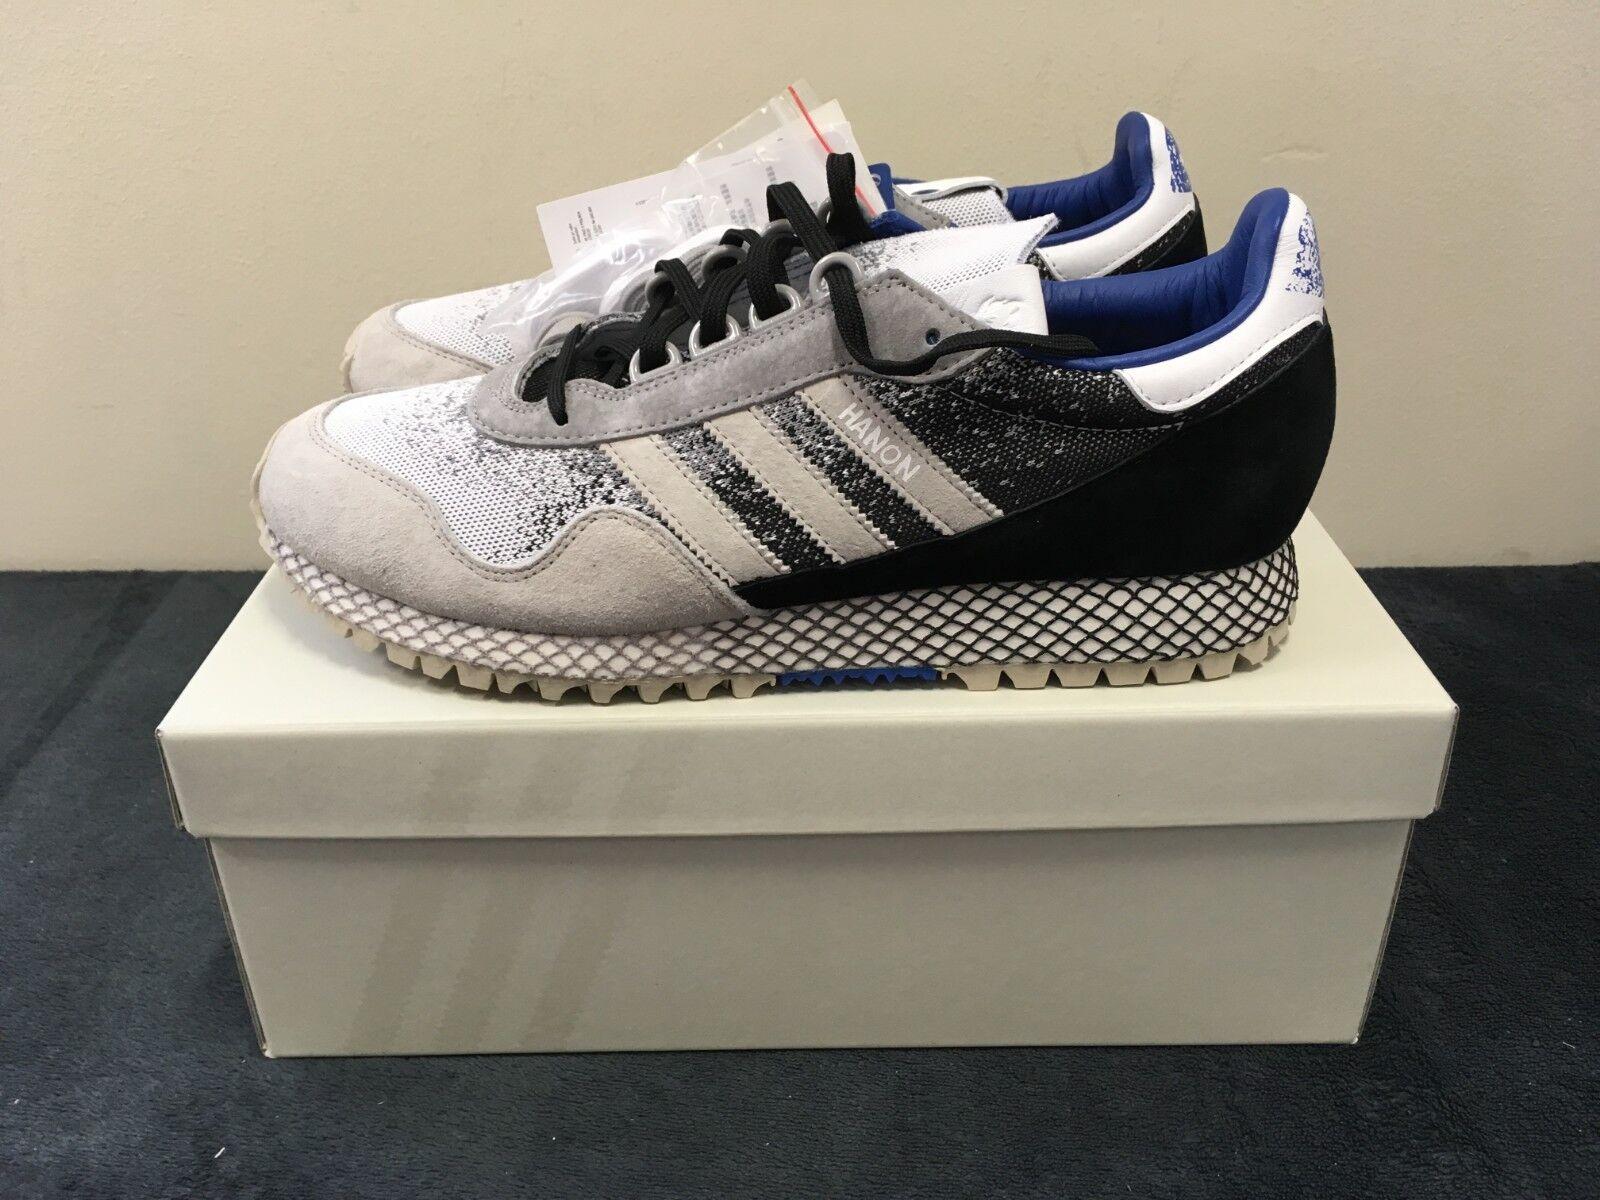 Adidas X Hanon-New York-Scuro STORM-Consortium-  10